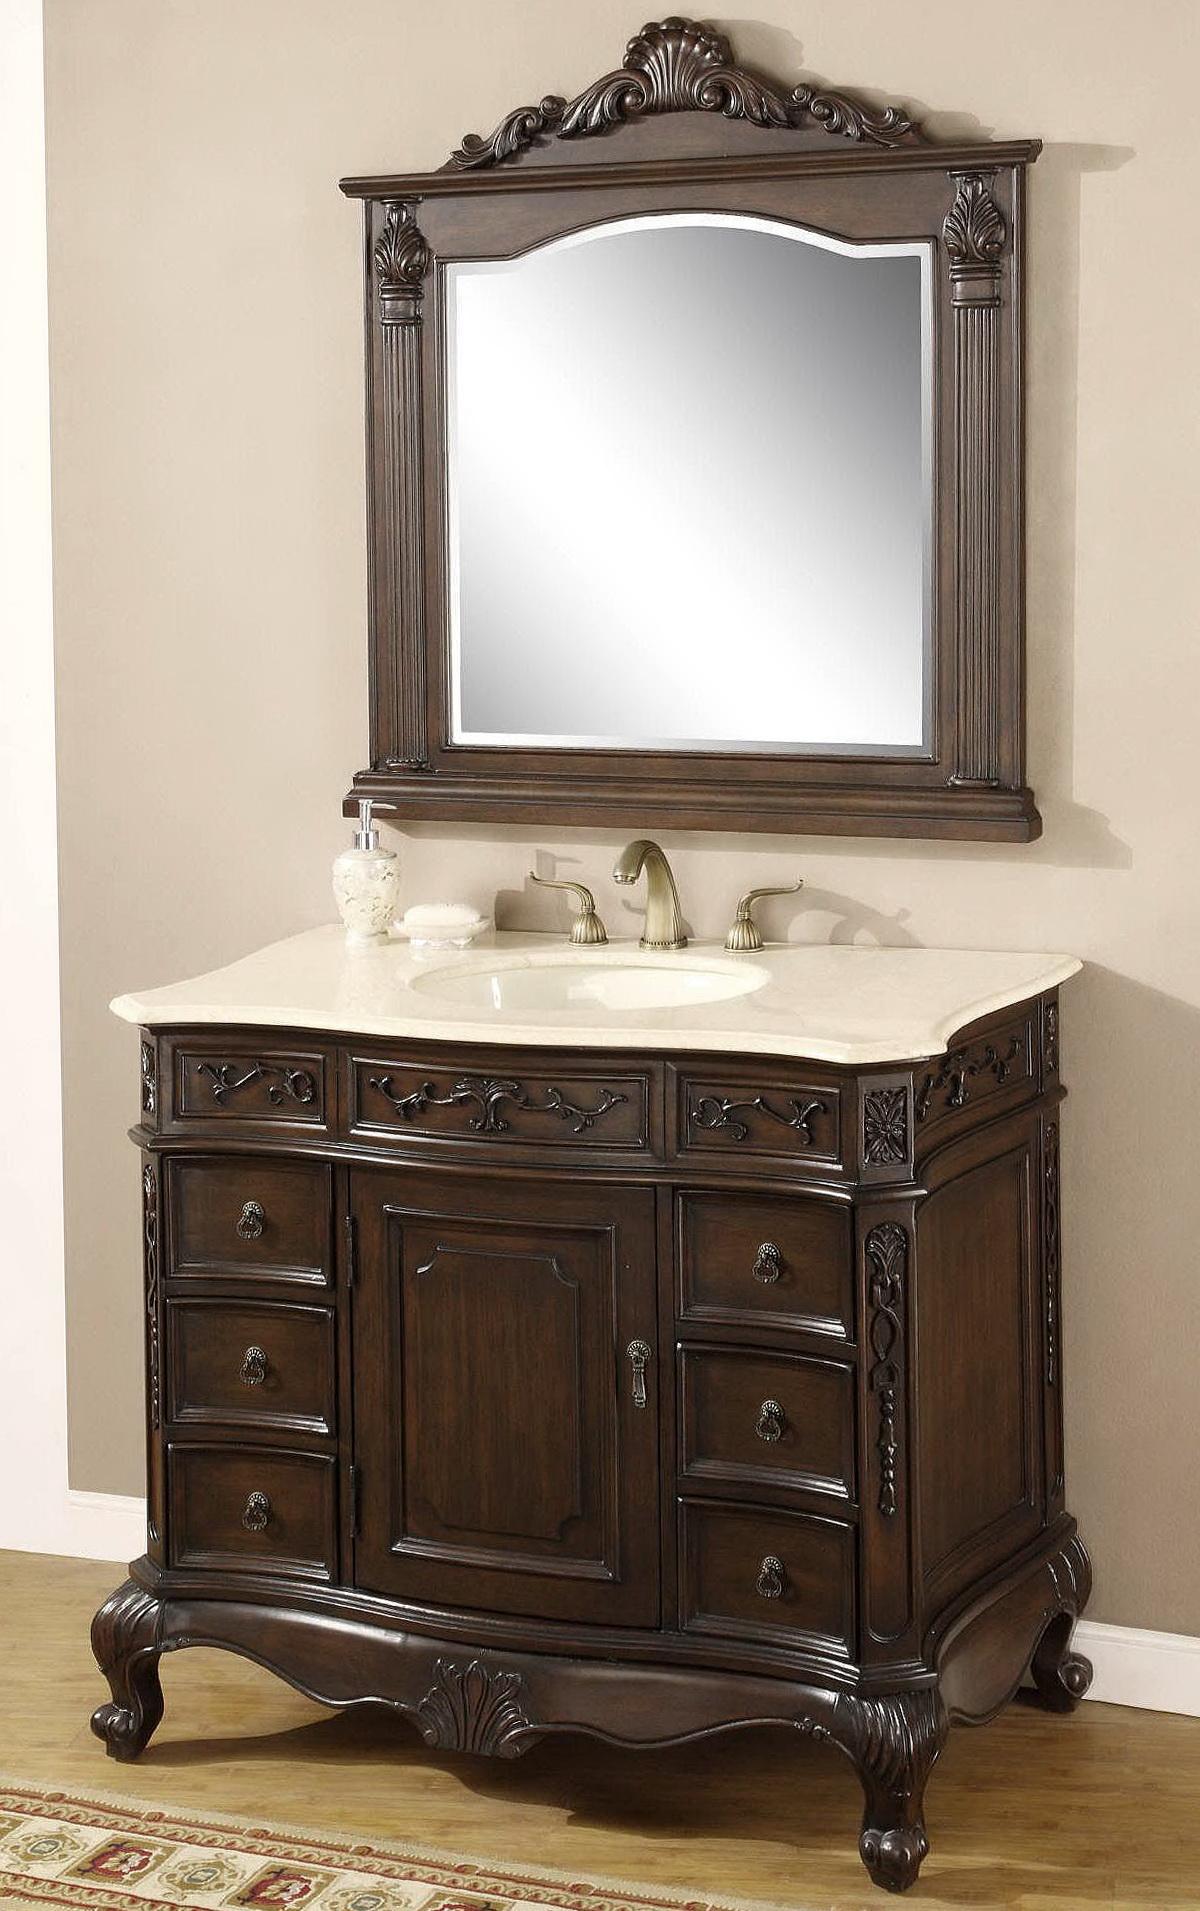 gm in marble tops with travertine b bathroom inch depot cherry cheswick vanity grand vanities the bath tr home top stufurhome n dark